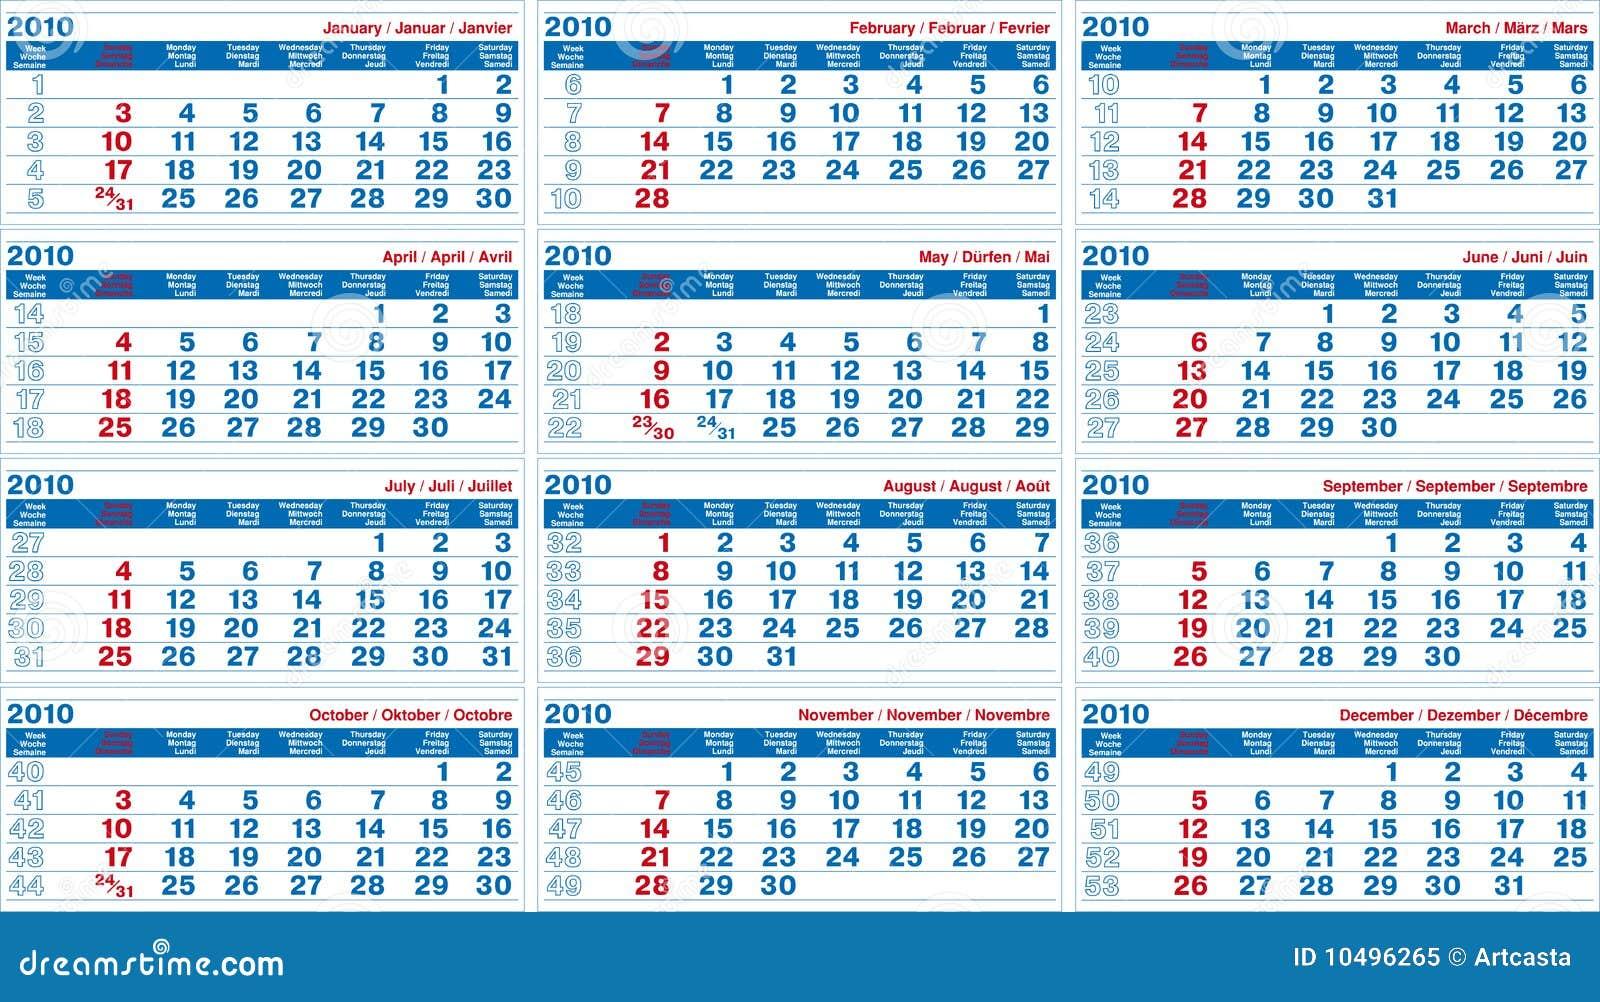 Calendar 2010 Royalty Free Stock Photo - Image: 10496265